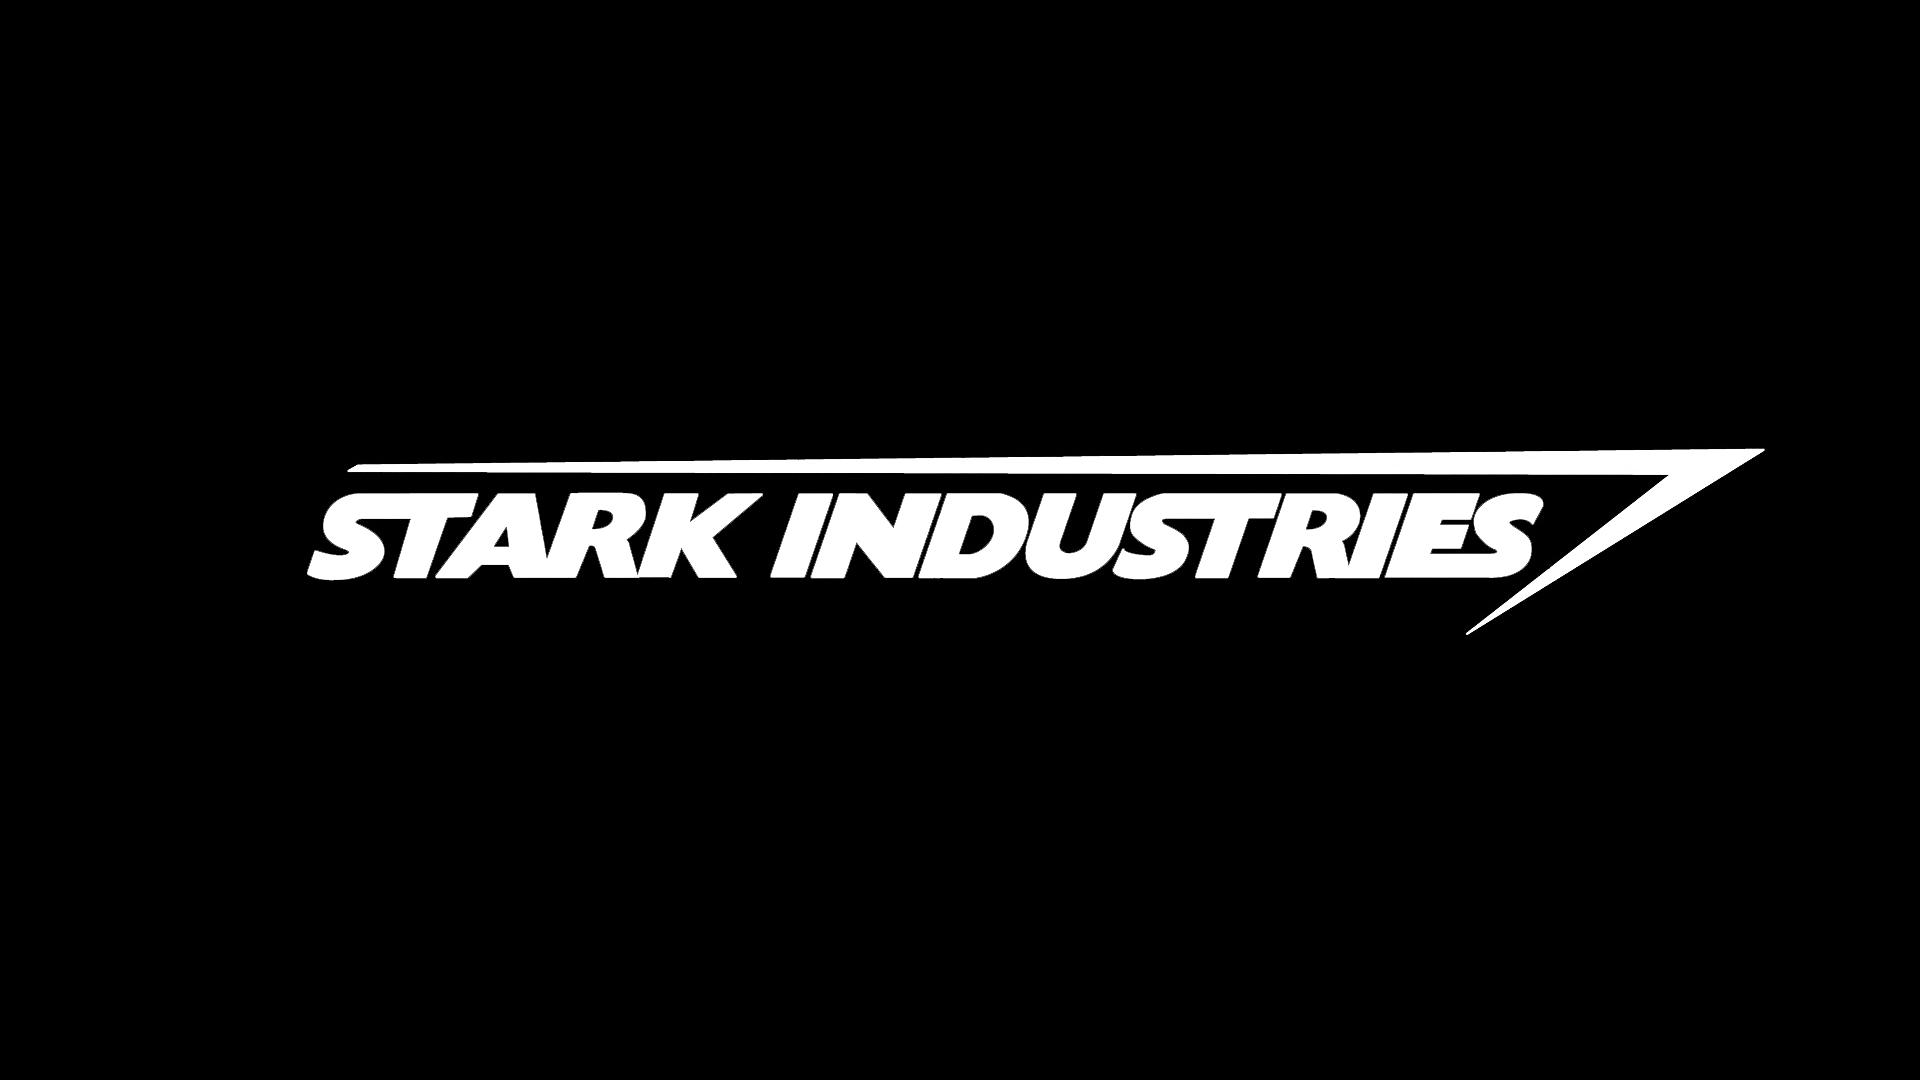 Stark Industries Guruh